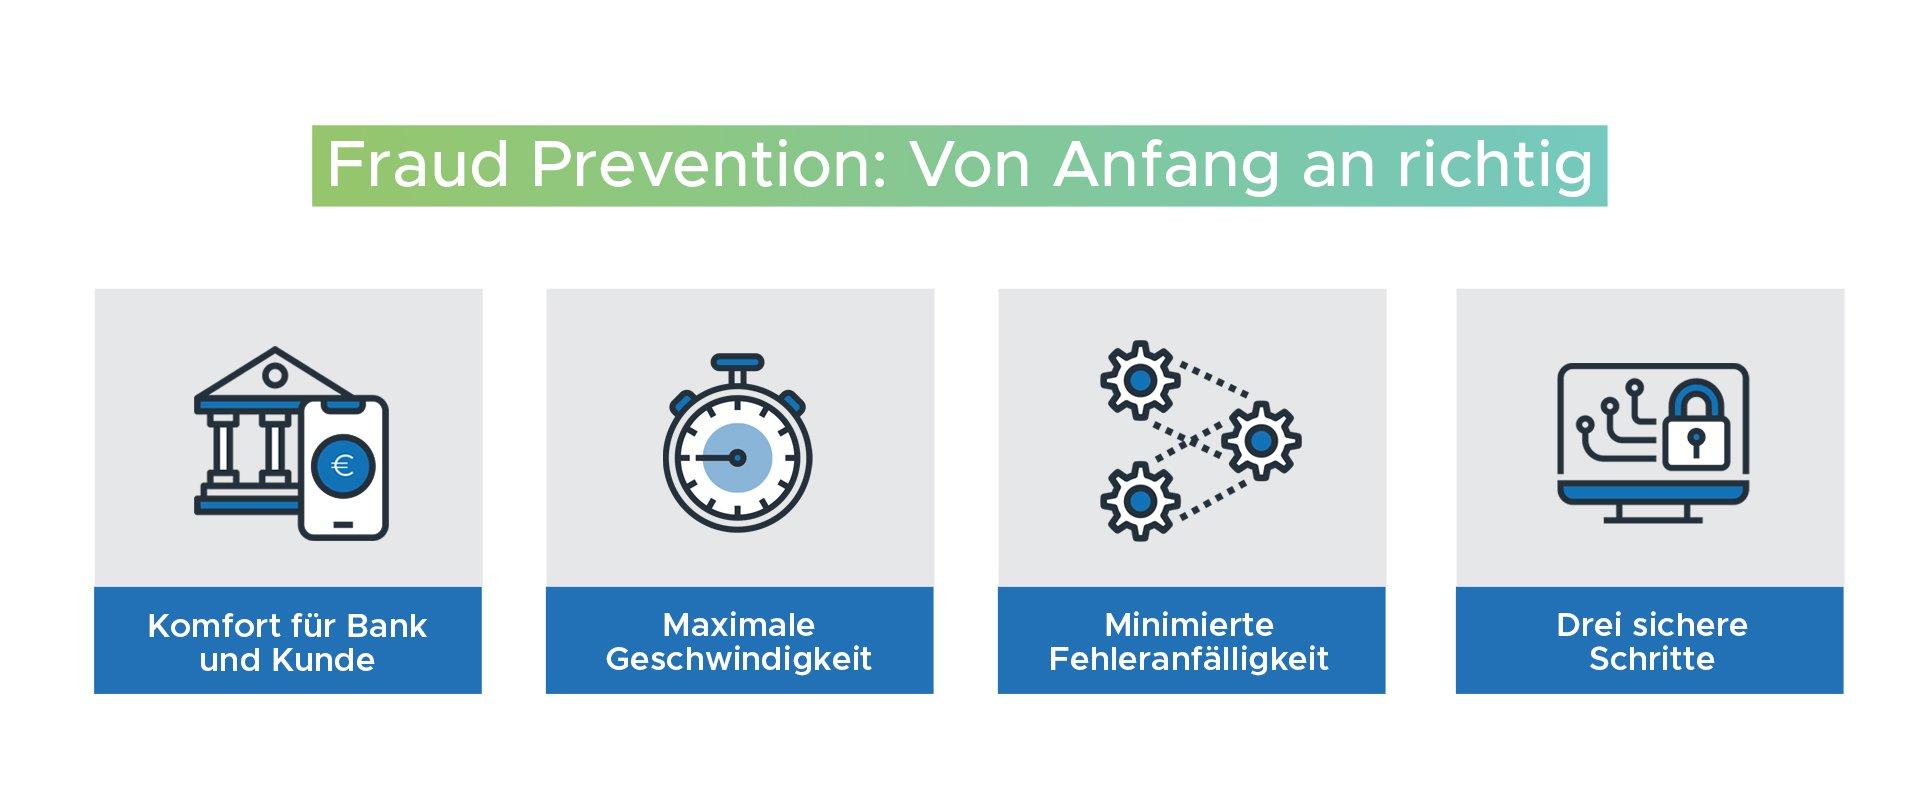 Fraud Prevention: Von Anfang an richtig